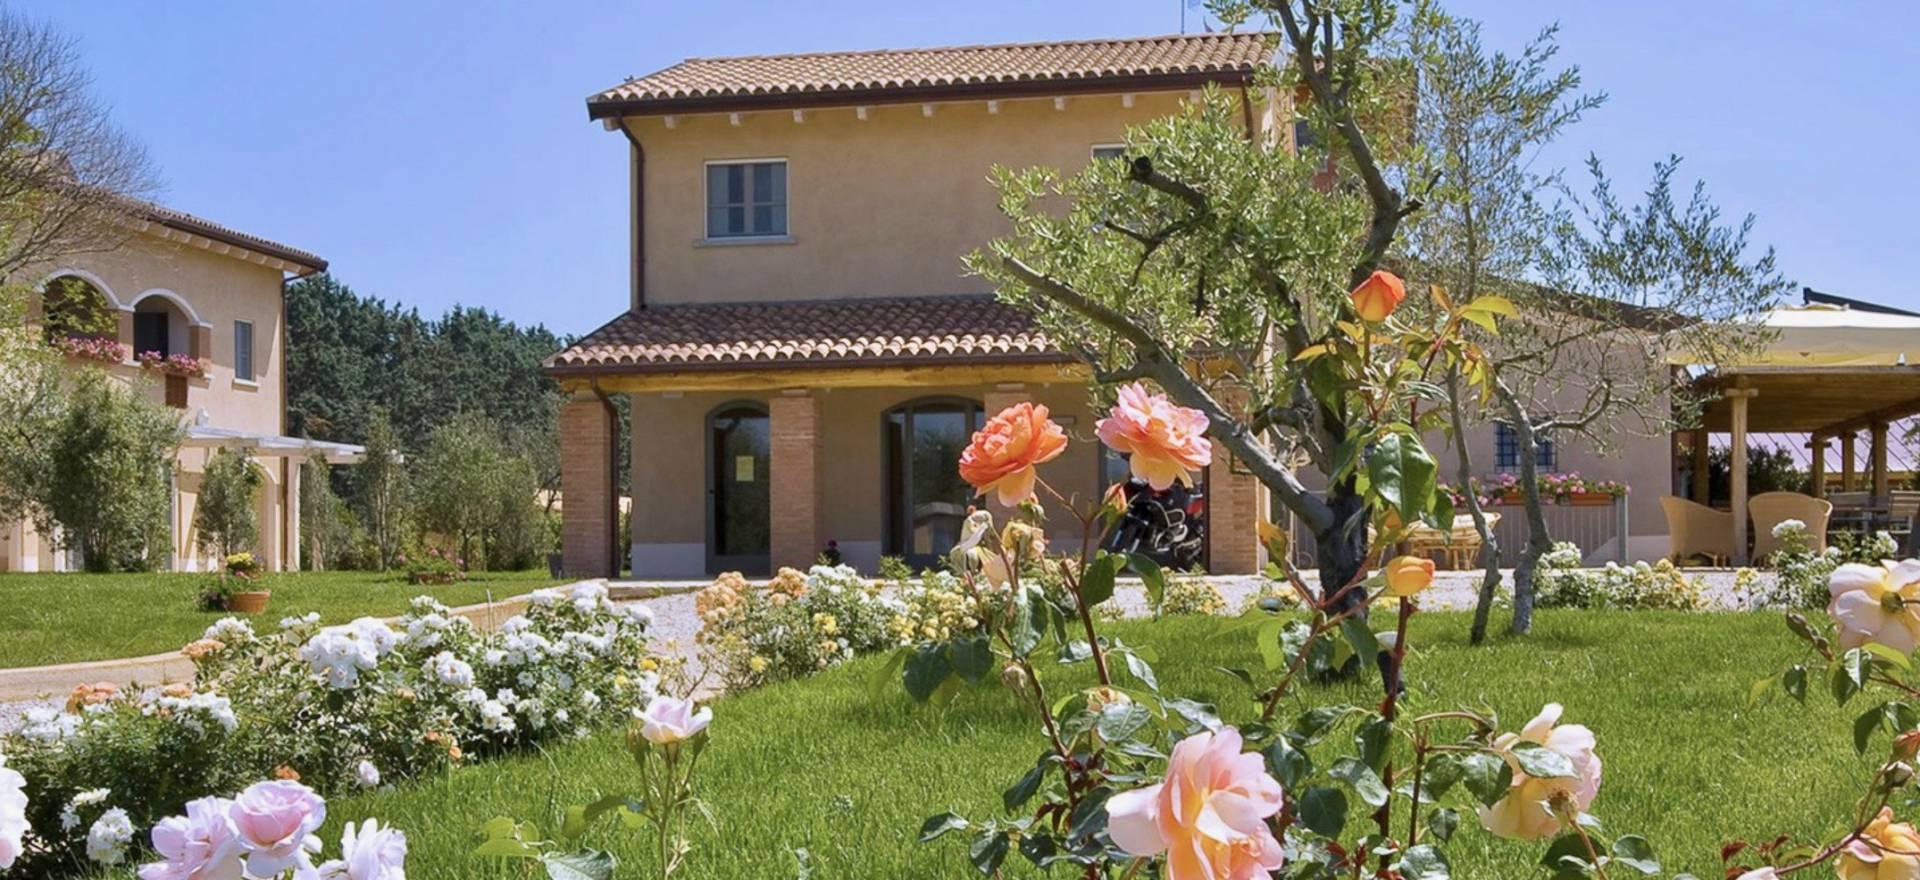 Agriturismo Toscana Agriturismo di lusso in Toscana, vicino alla spiaggia